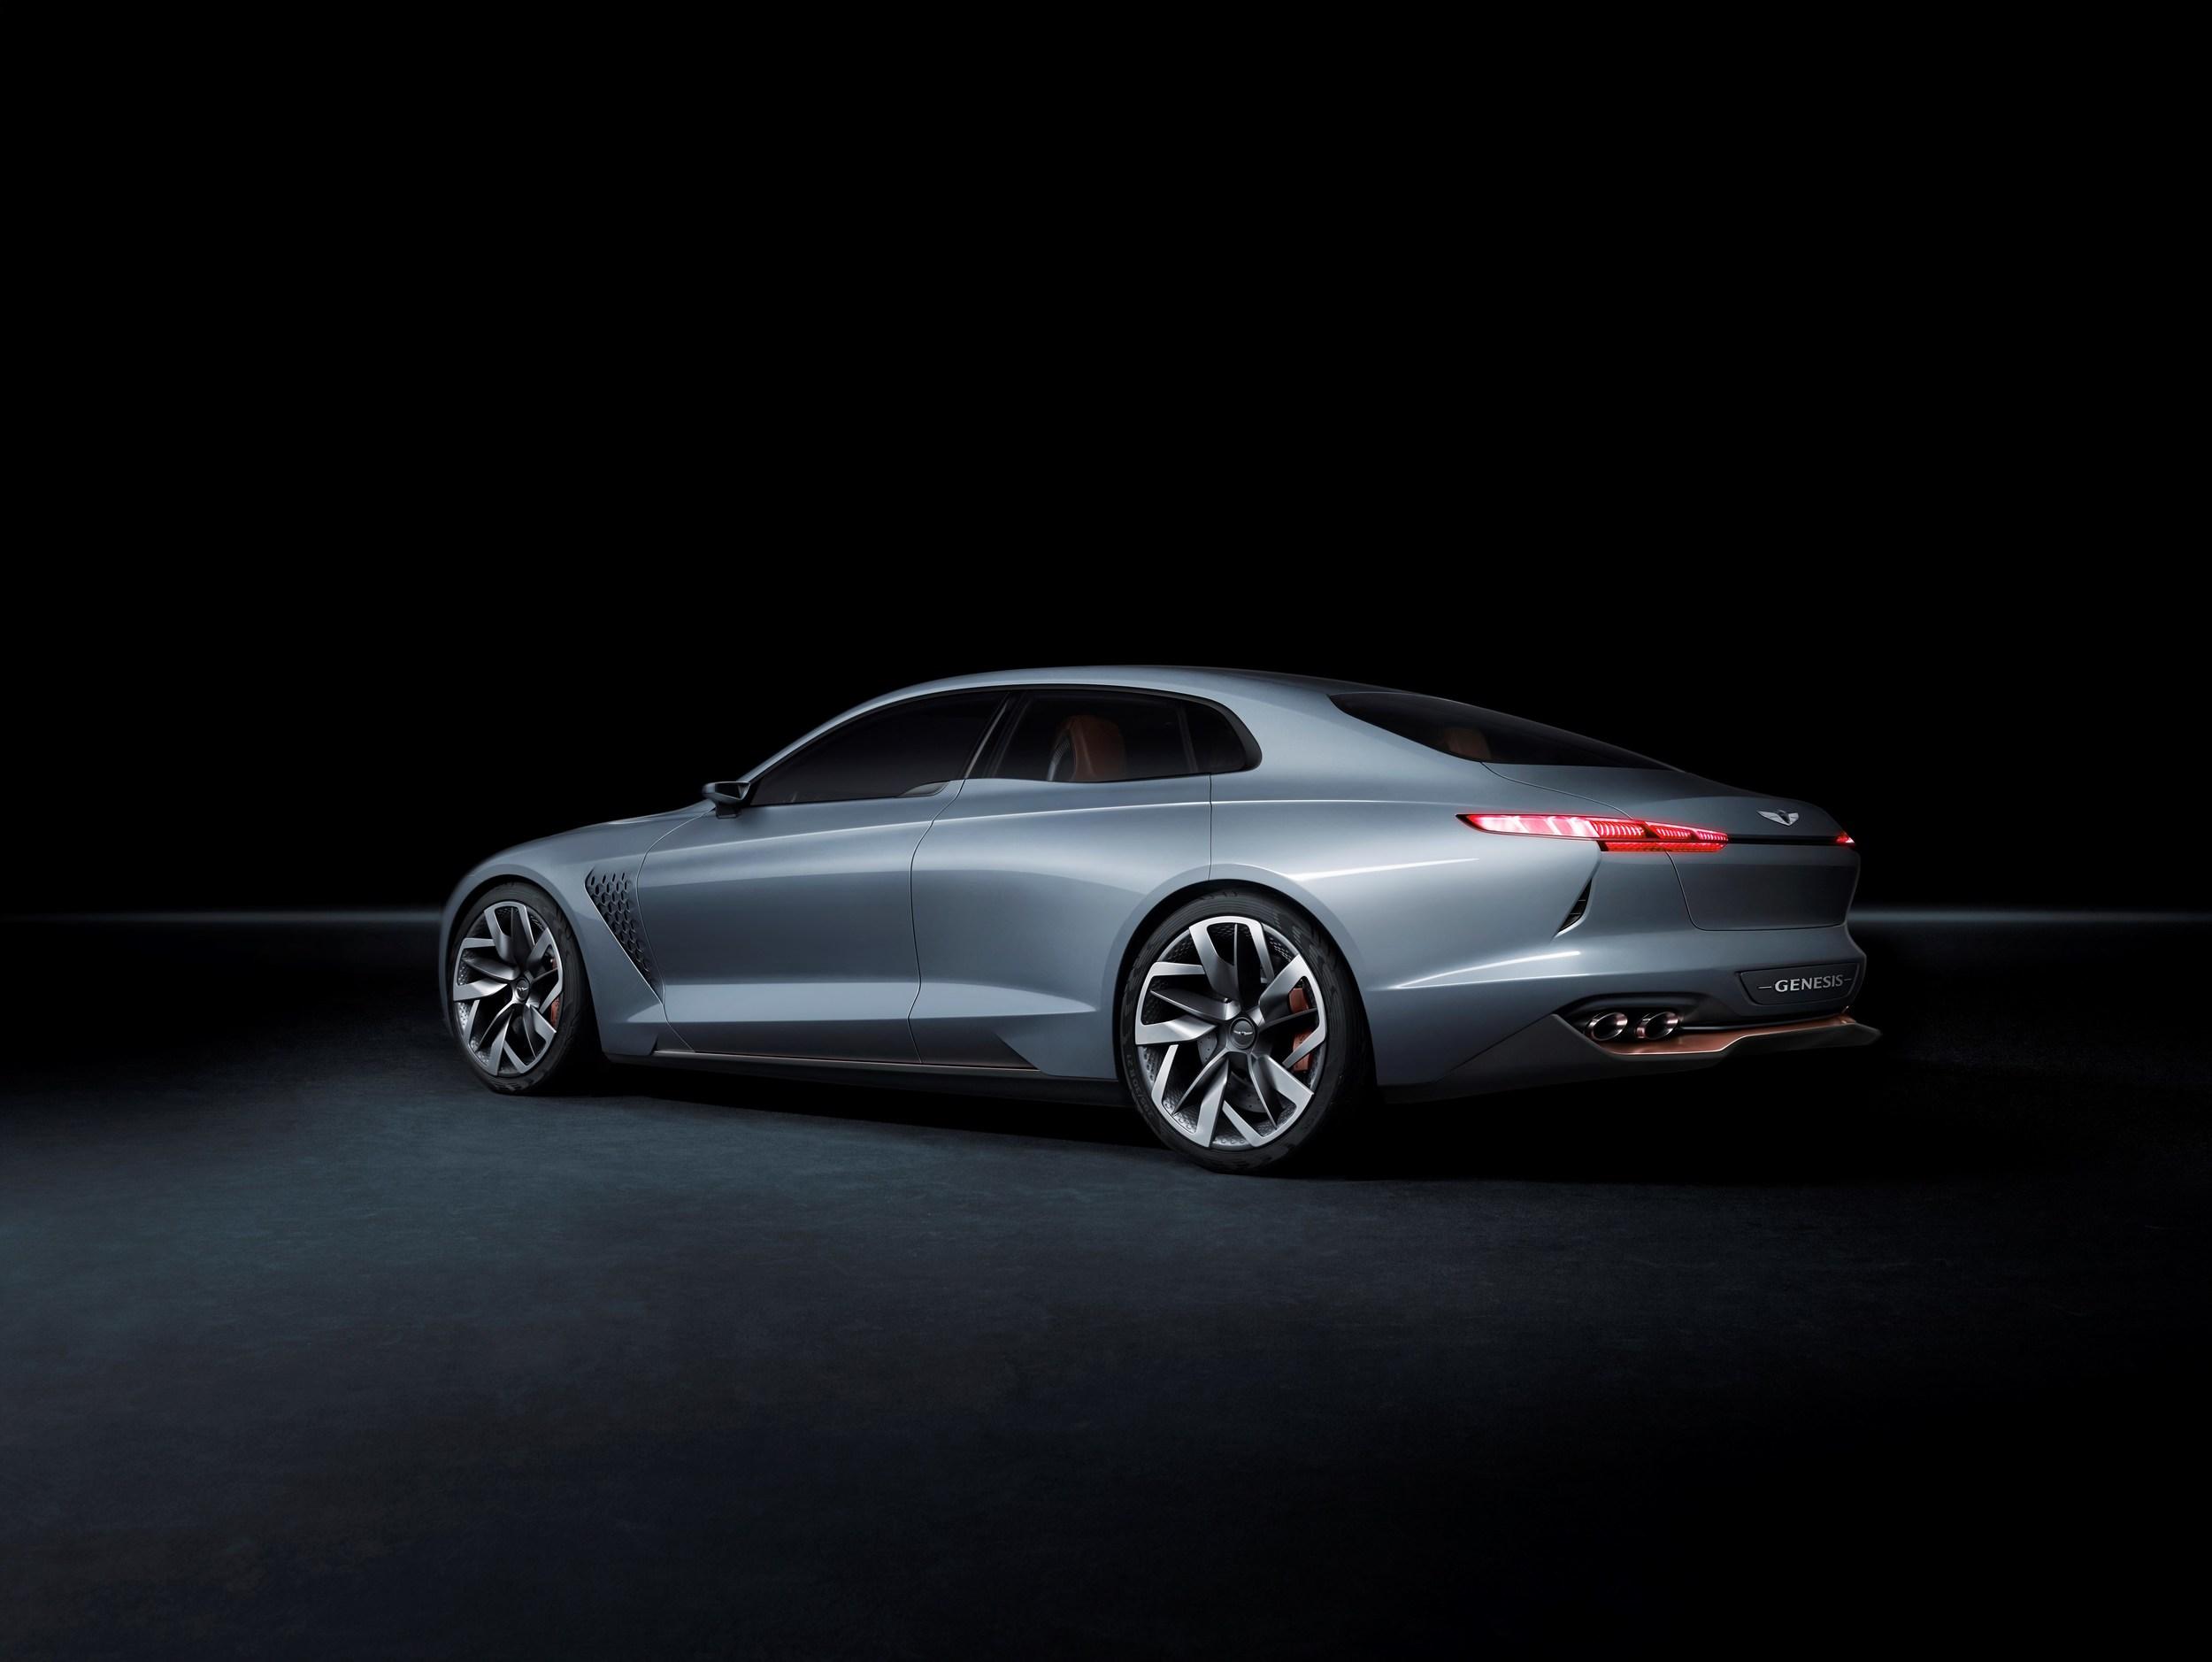 2018 Genesis G70 Sedan Previewed By Genesis New York Concept Autoevolution